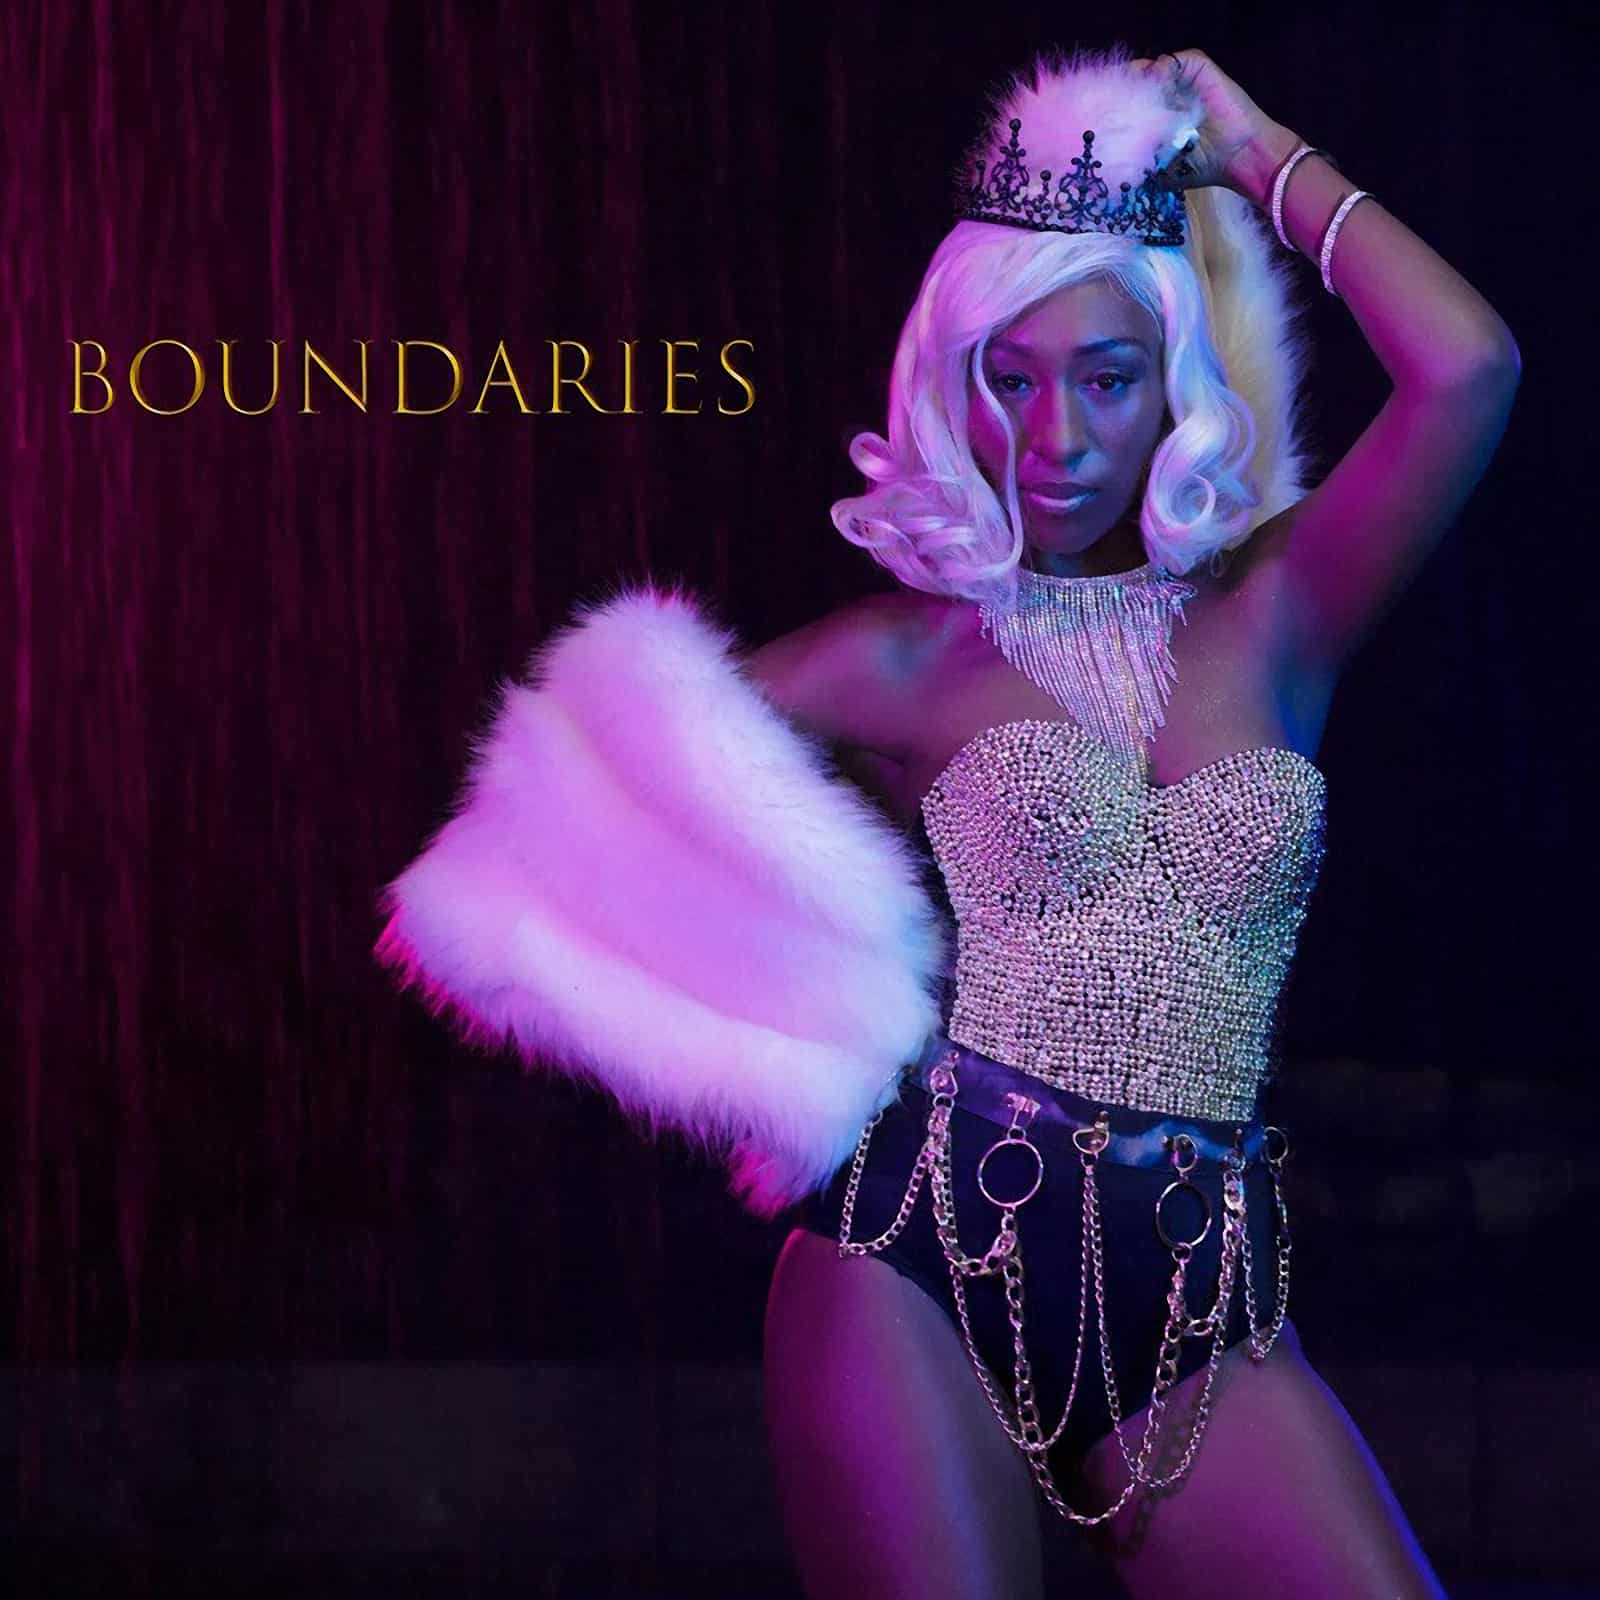 BOUNDARIES by K-VICTORIA